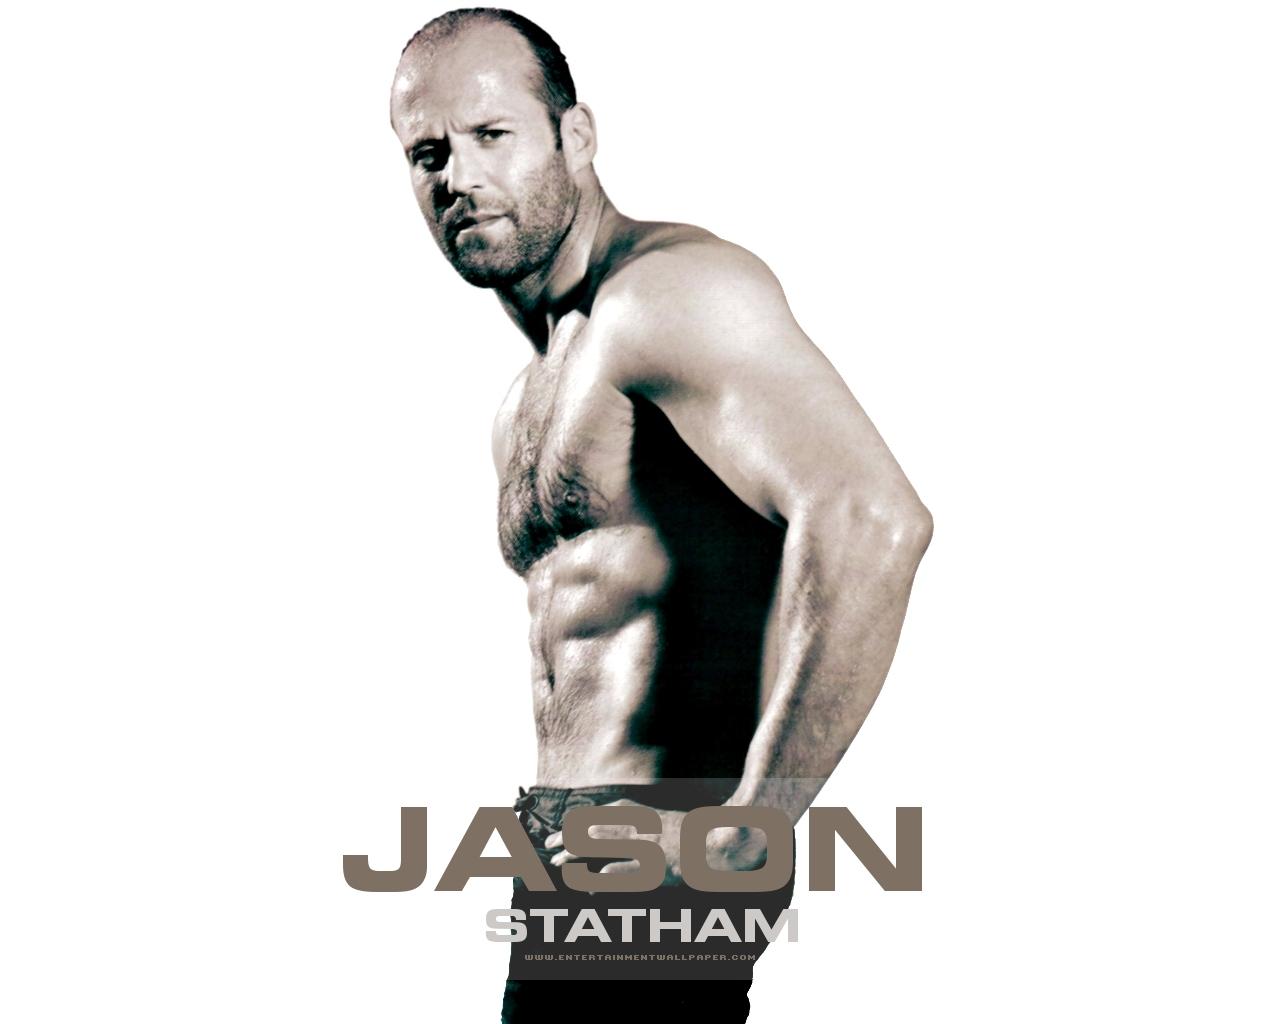 47] Jason Statham Wallpaper on WallpaperSafari 1280x1024